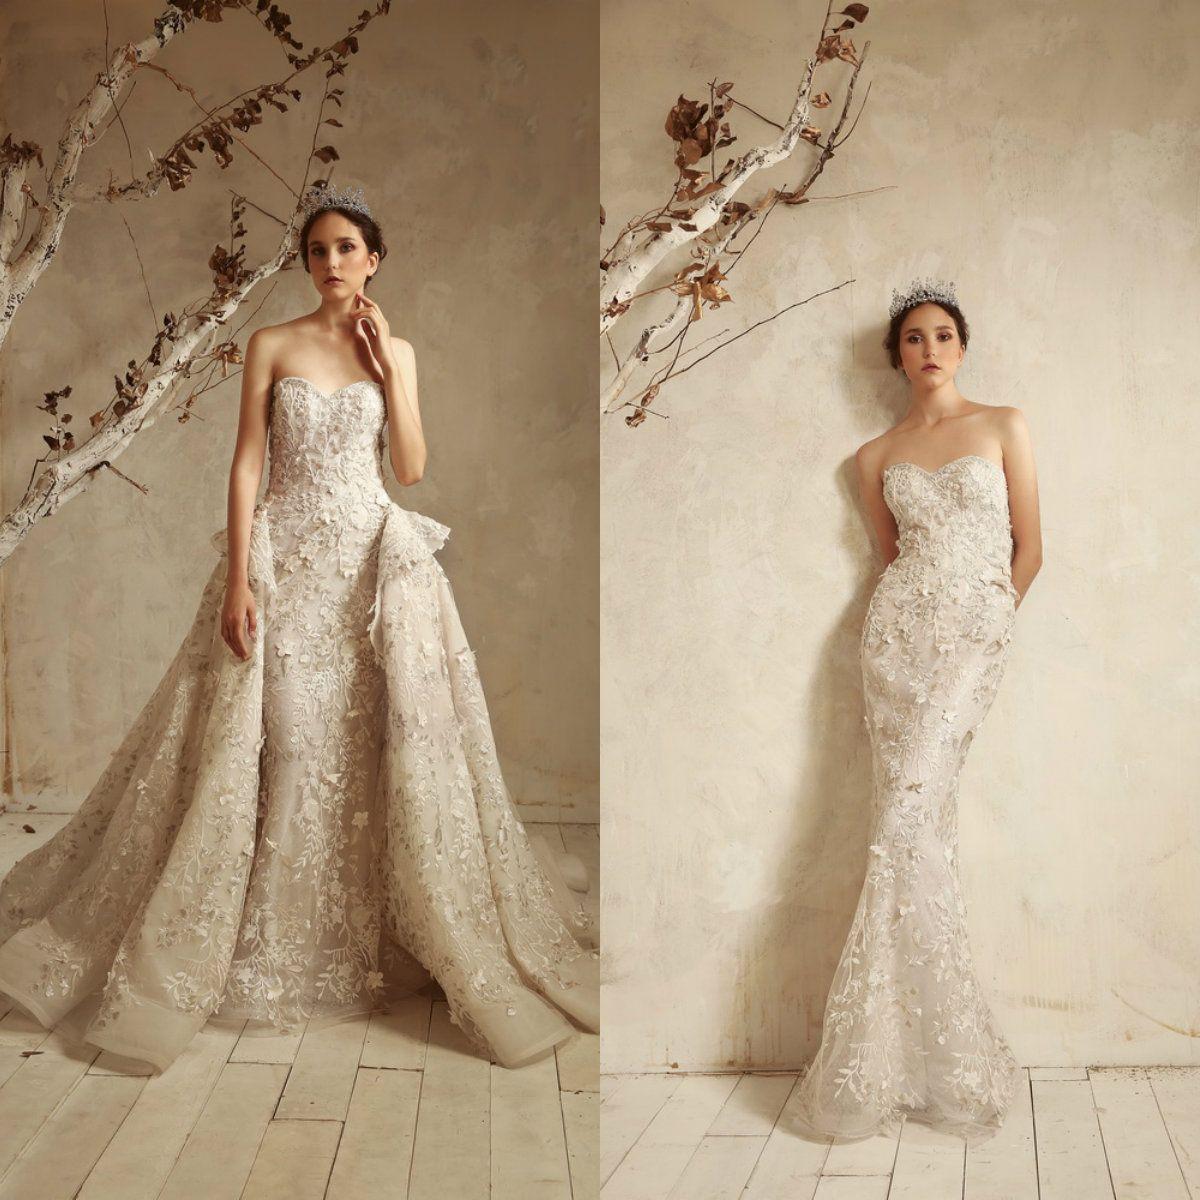 57cb0a1fd4 Tony Ward 2019 Mermaid Wedding Dresses With Detachable Train Sweetheart  Gorgeous Women Vestido De Novia Lace Appliques Beach Wedding Dresses Wedding  Lace ...